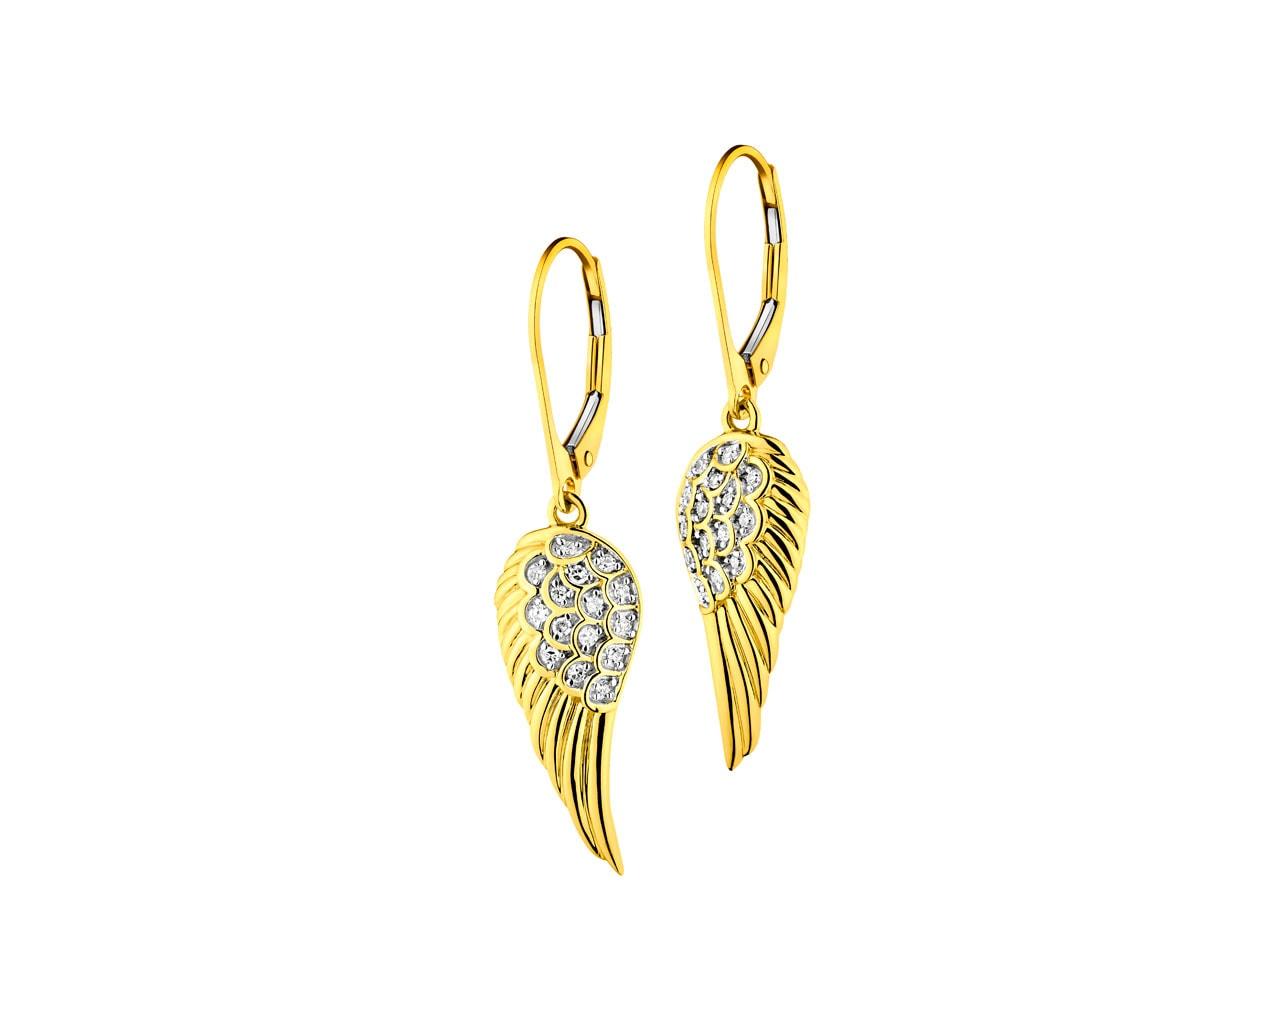 Yellow Gold Diamond Earrings Angel S Wings Ref No 181 250 Apart